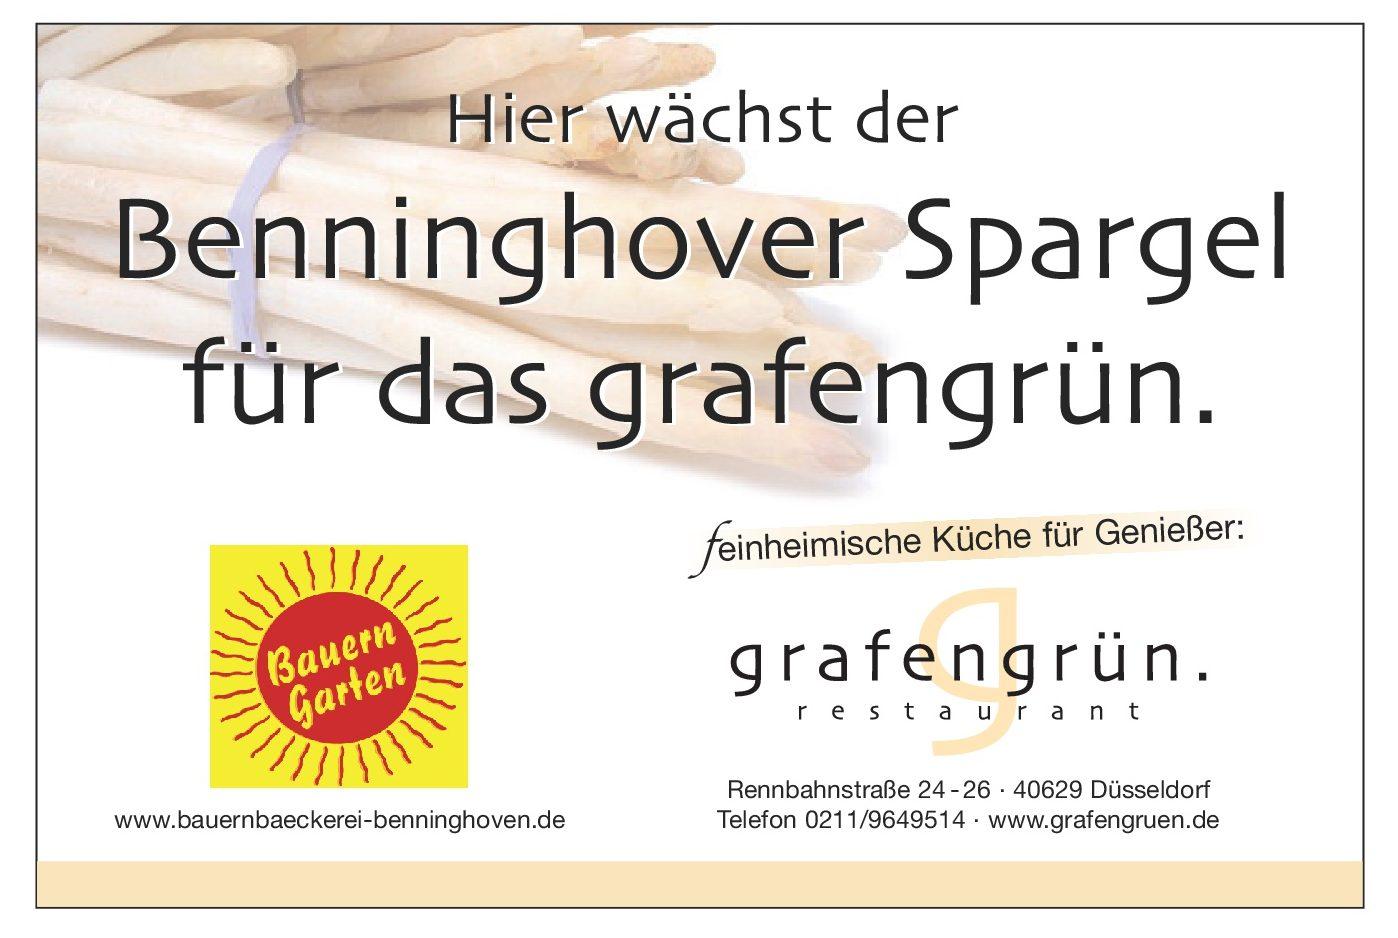 grafengruen_spargel